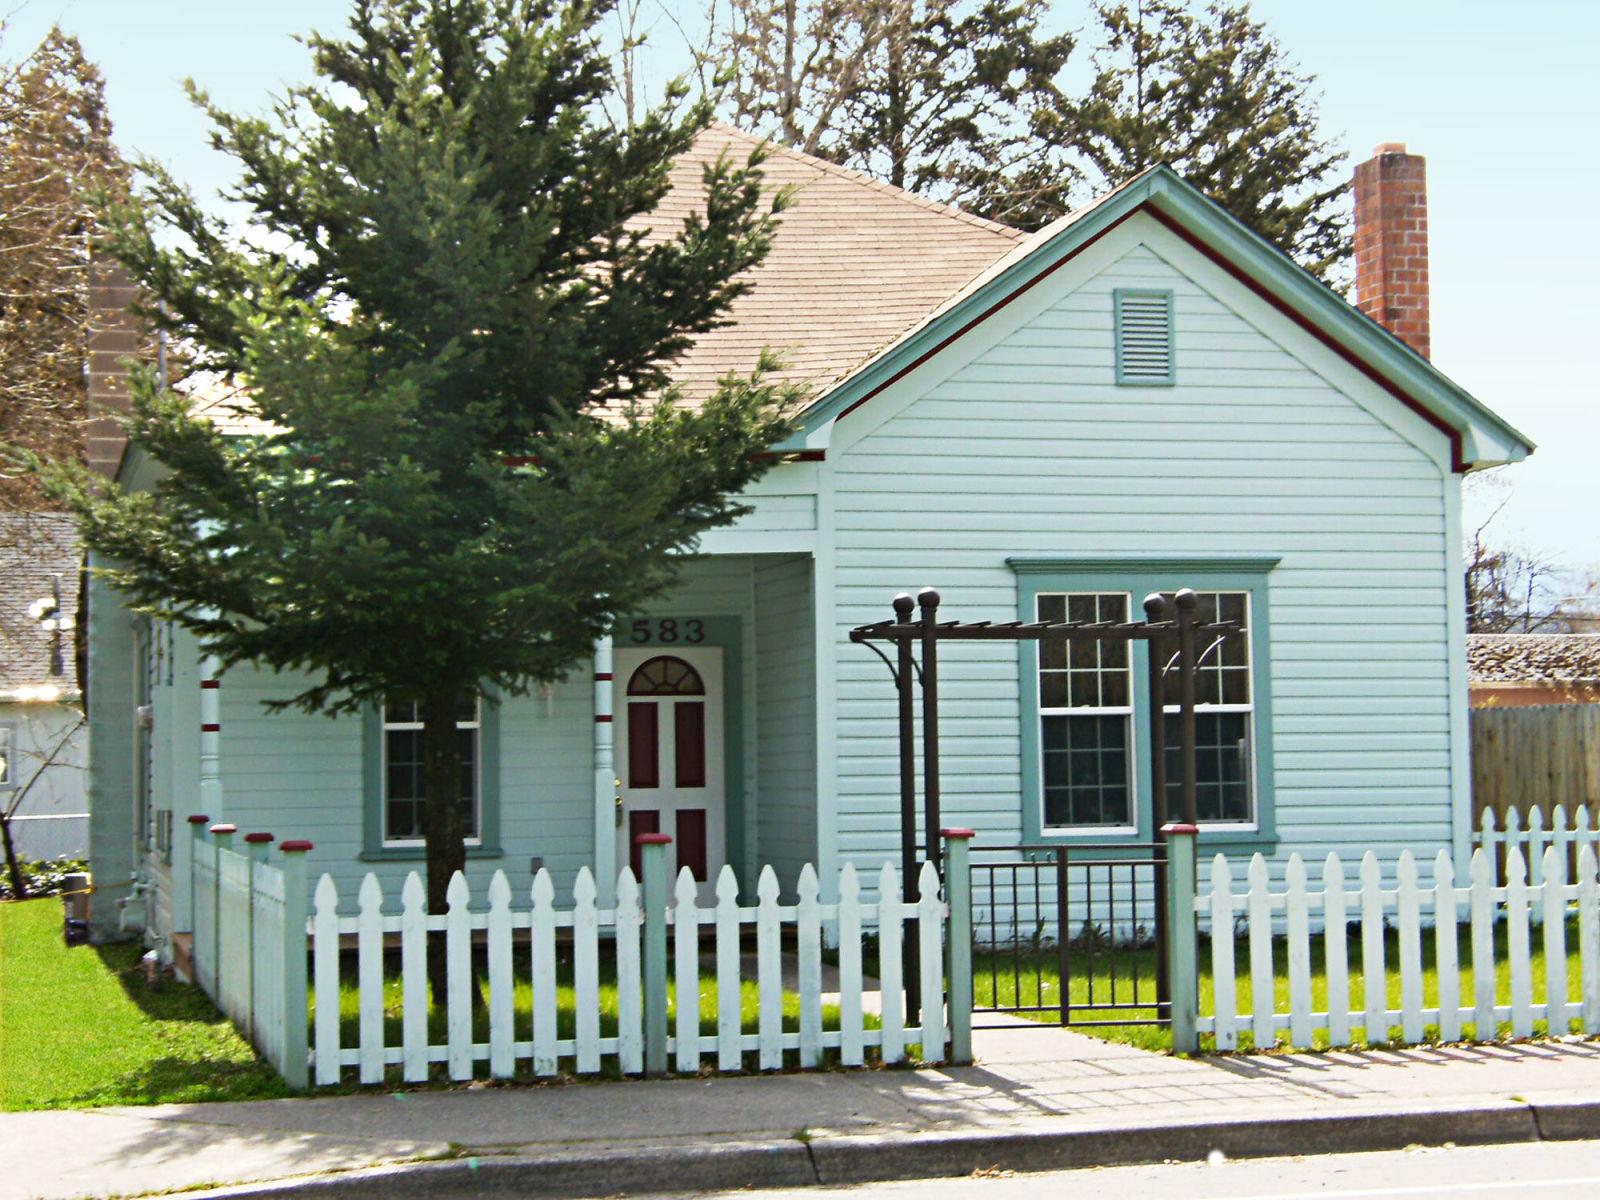 28 new photos photos of small quaint homes